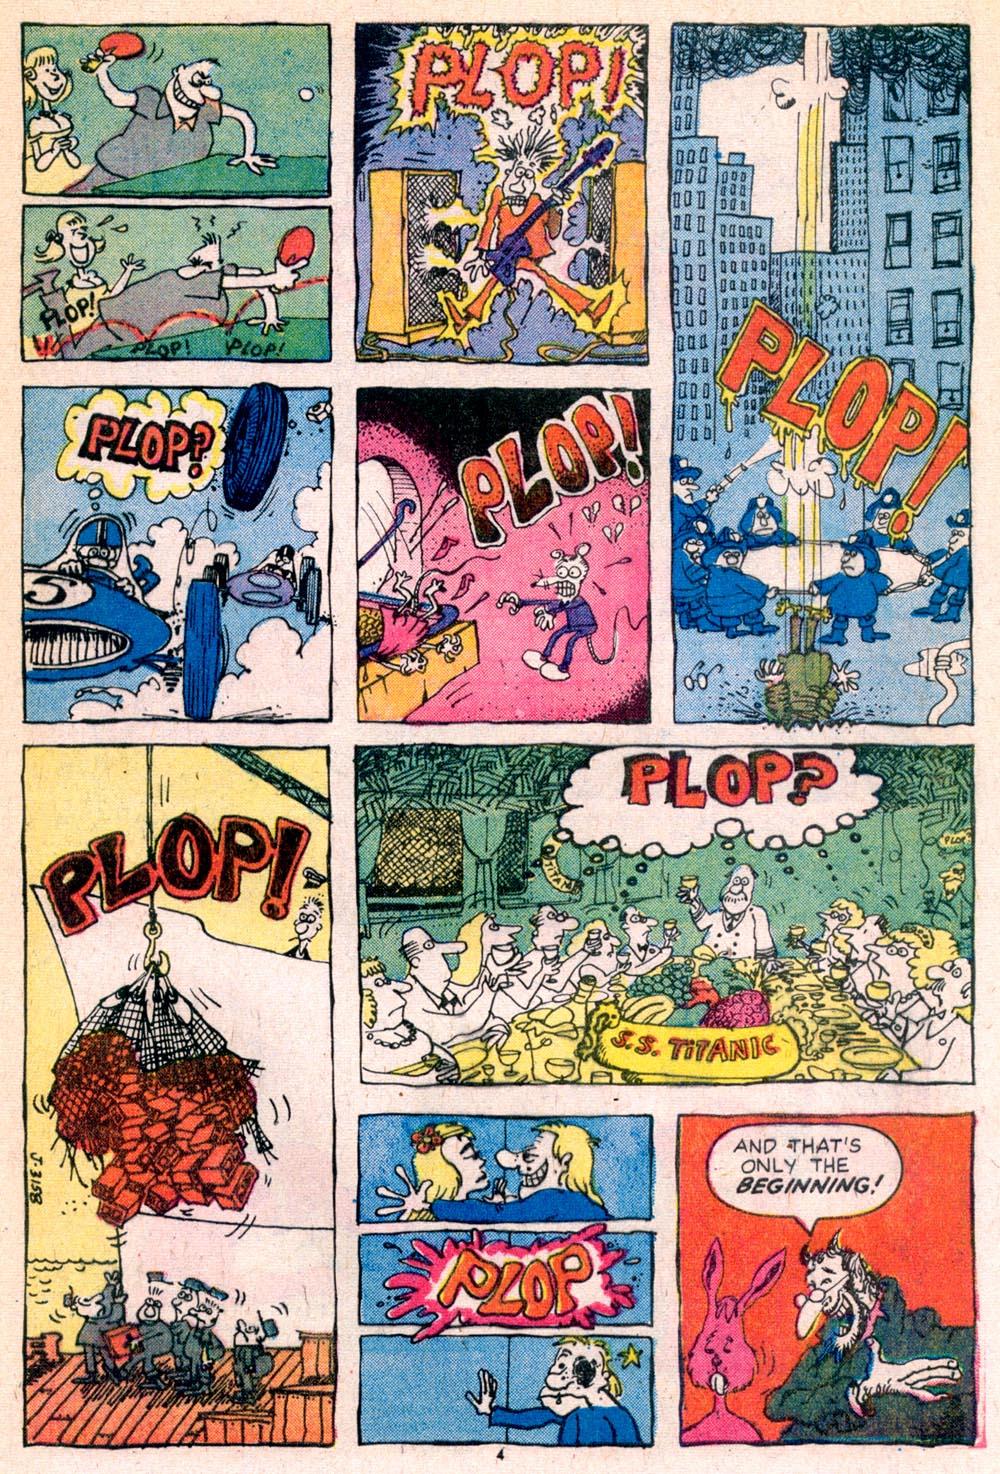 Read online Plop! comic -  Issue #5 - 5